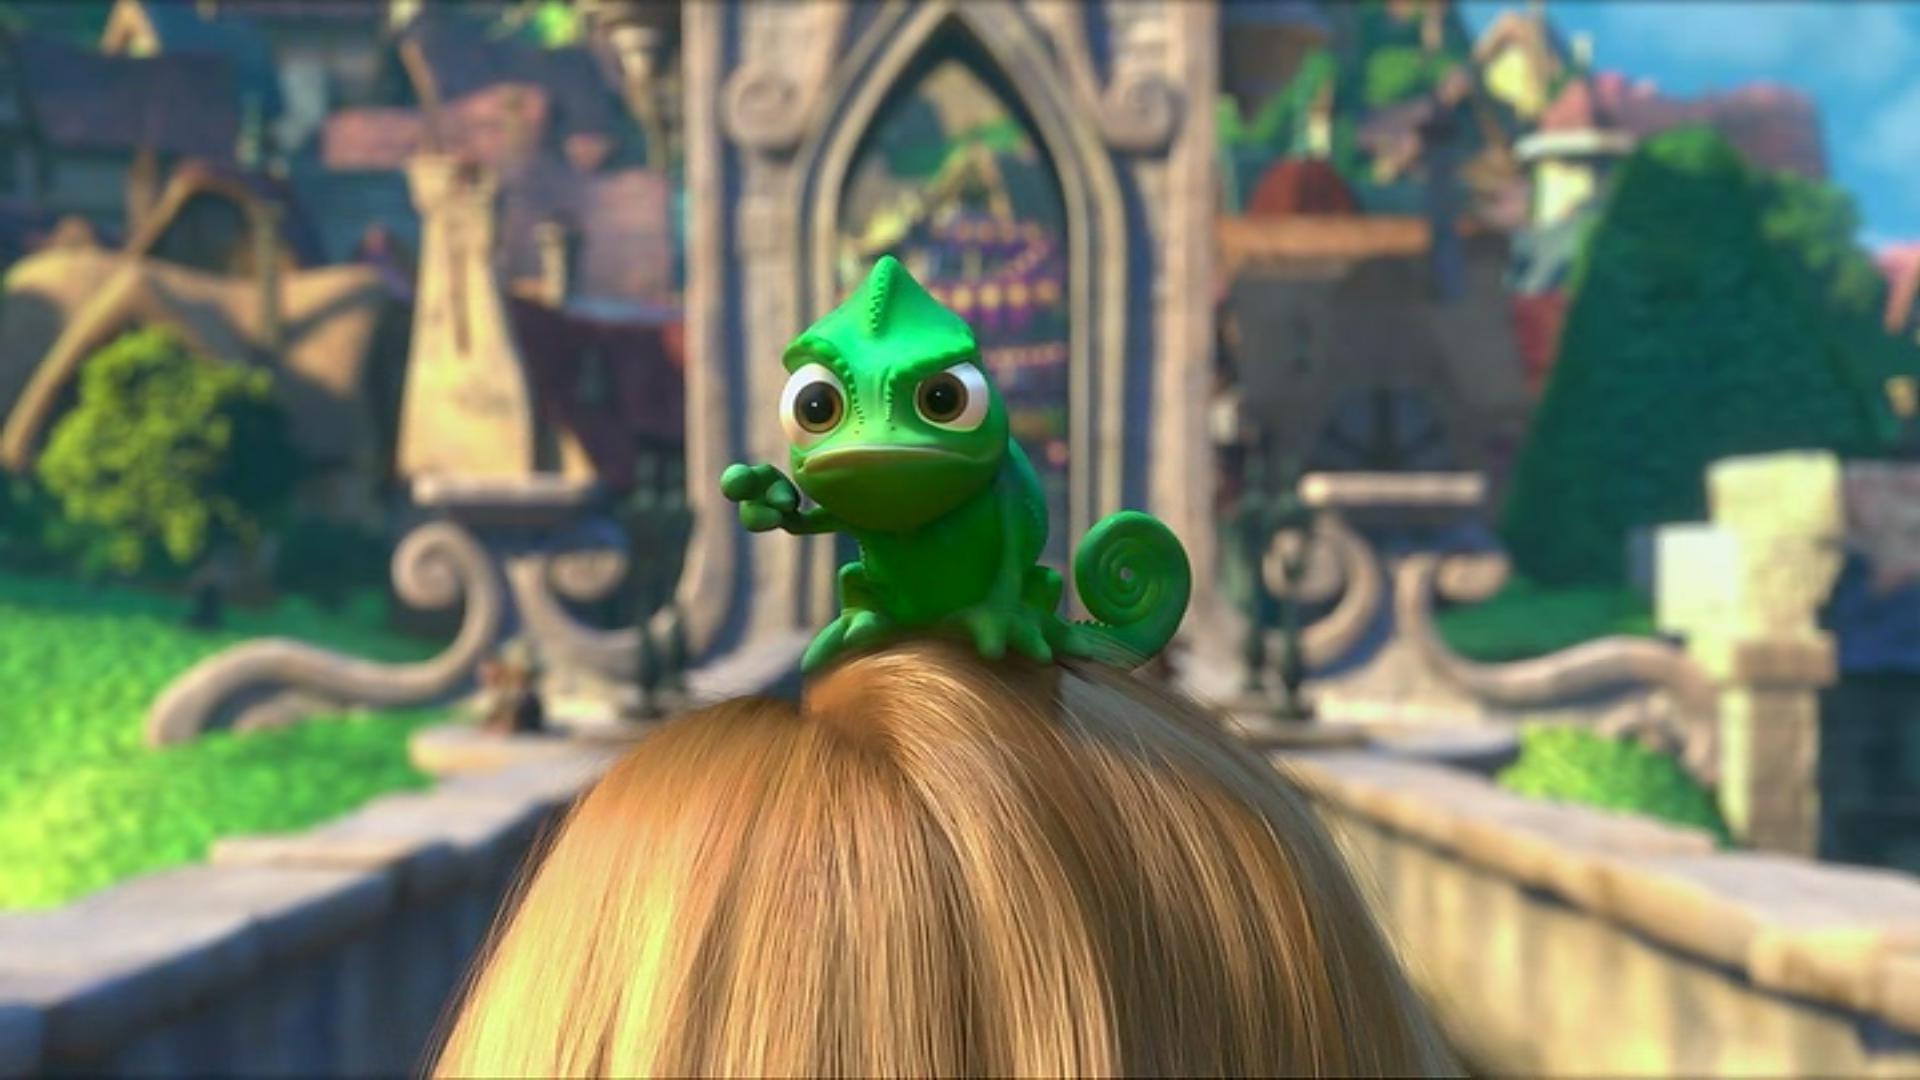 1920x1080 Px Disney Movies Rapunzel Tangled